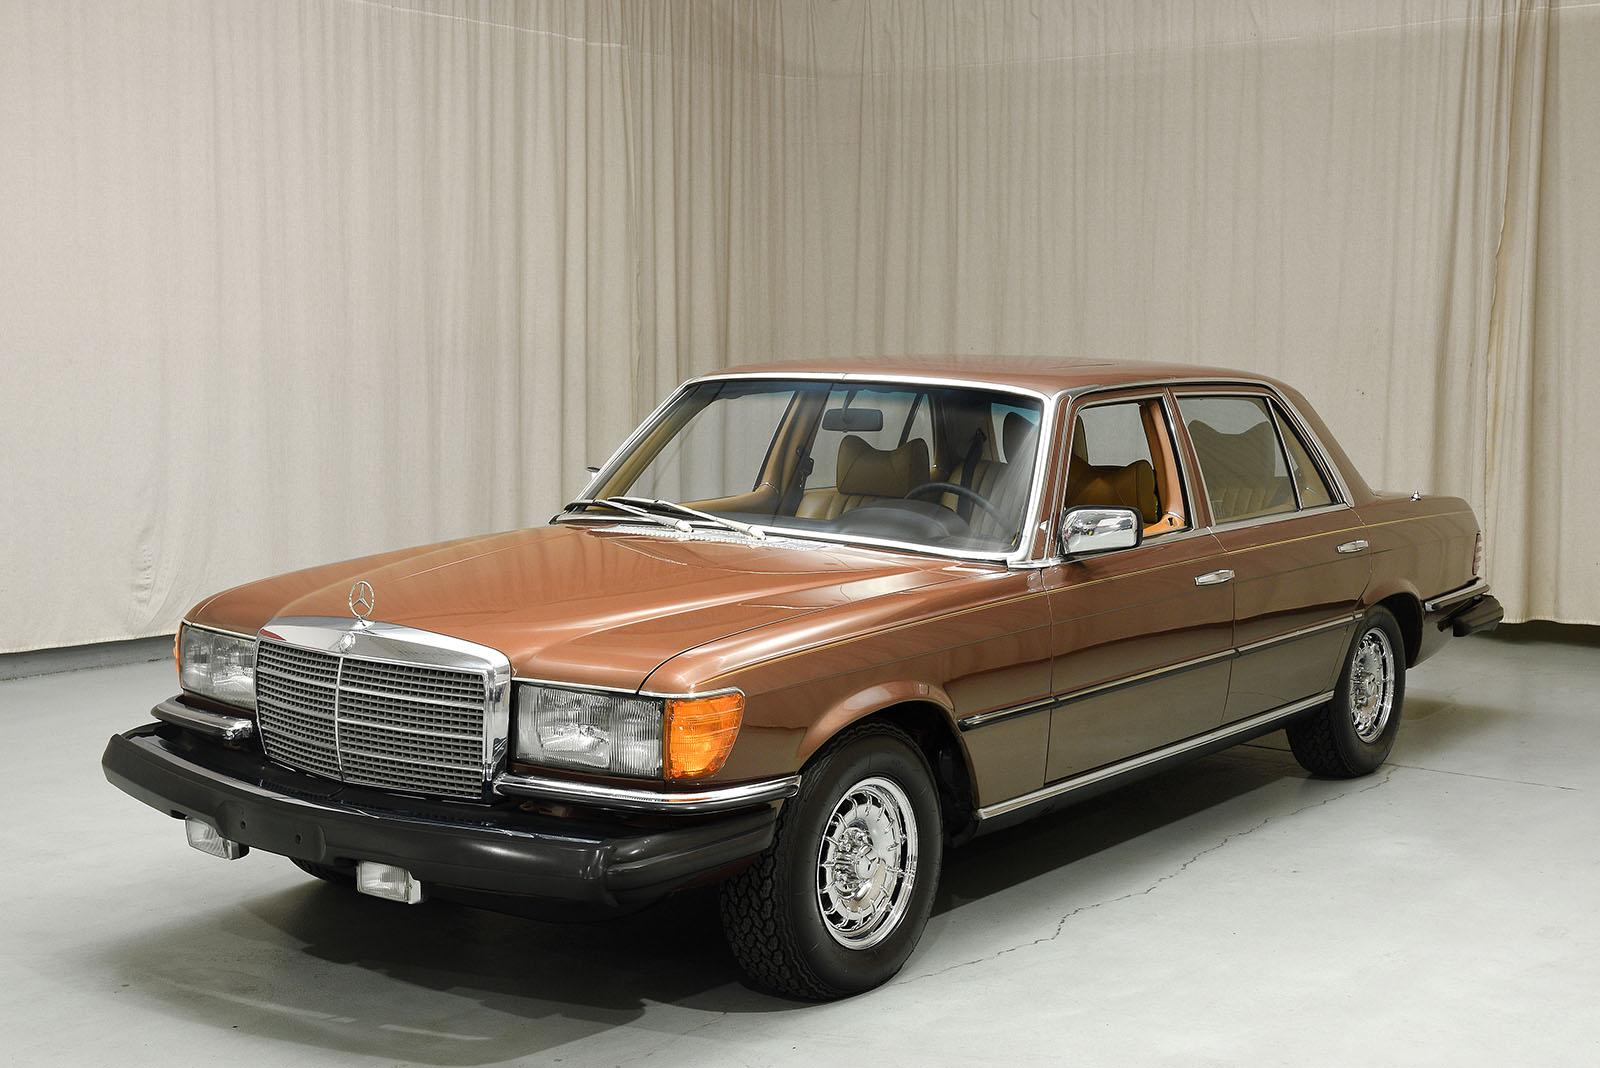 1979 mercedes benz 450 sel 6 9 sedan for Mercedes benz 450 sel 6 9